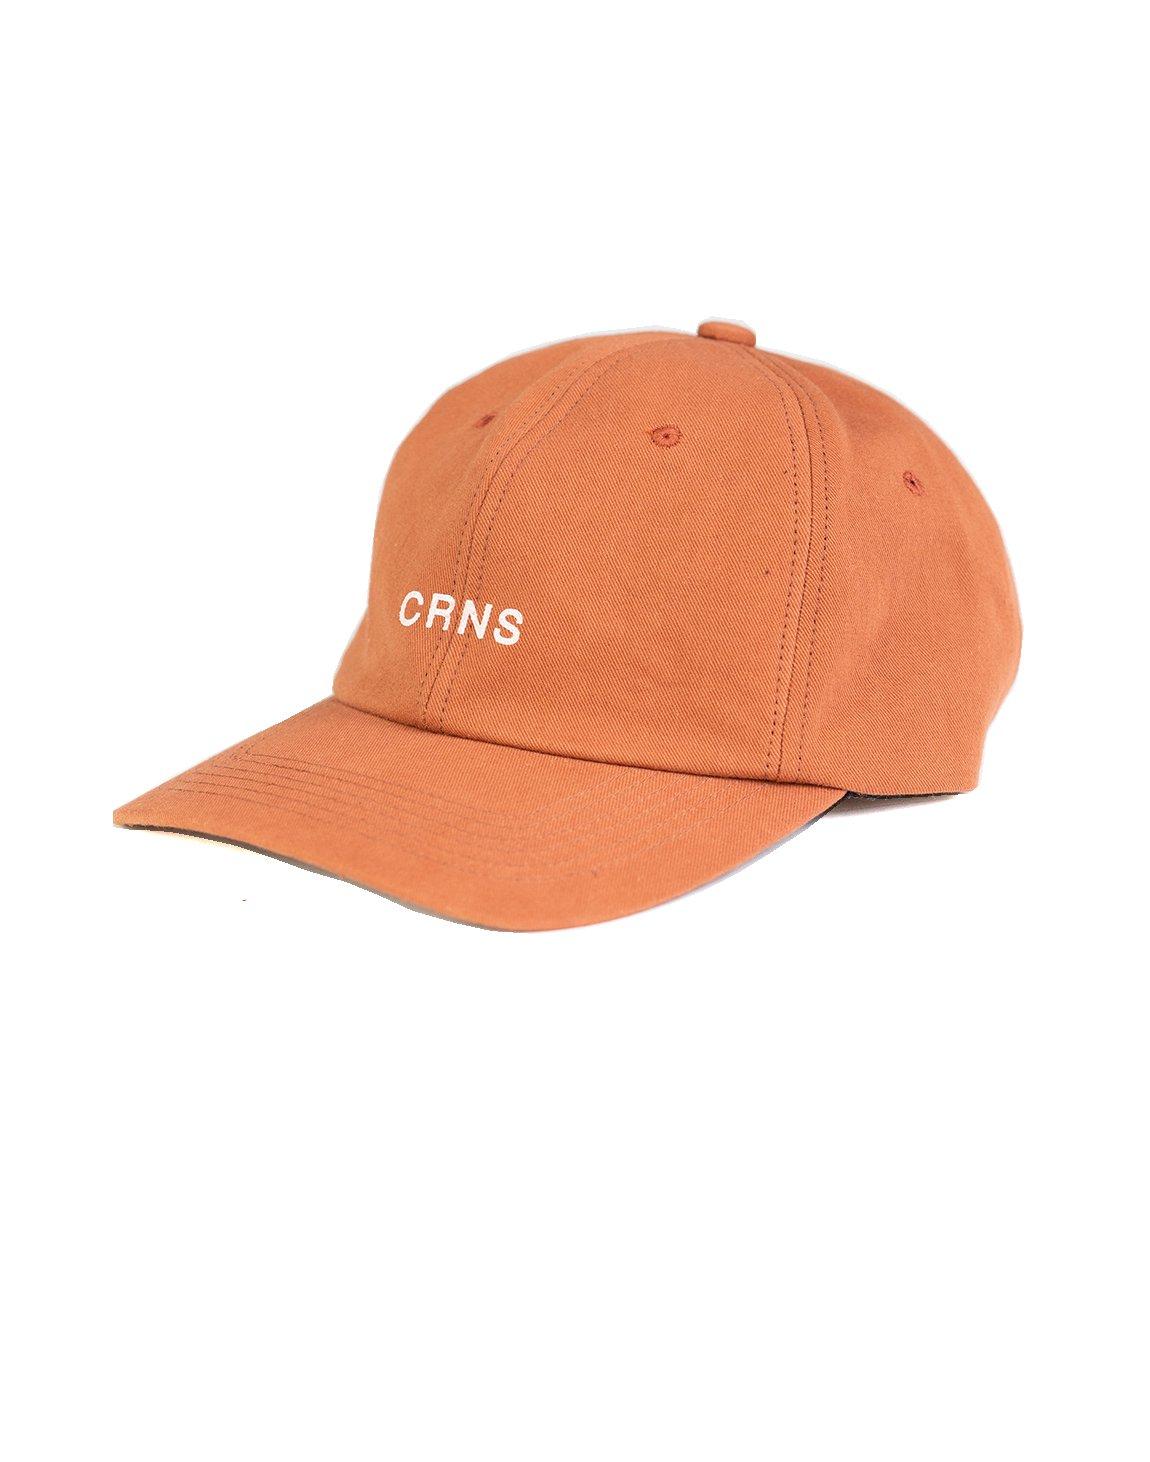 CRNS WASH LOGO CAP ORANGE